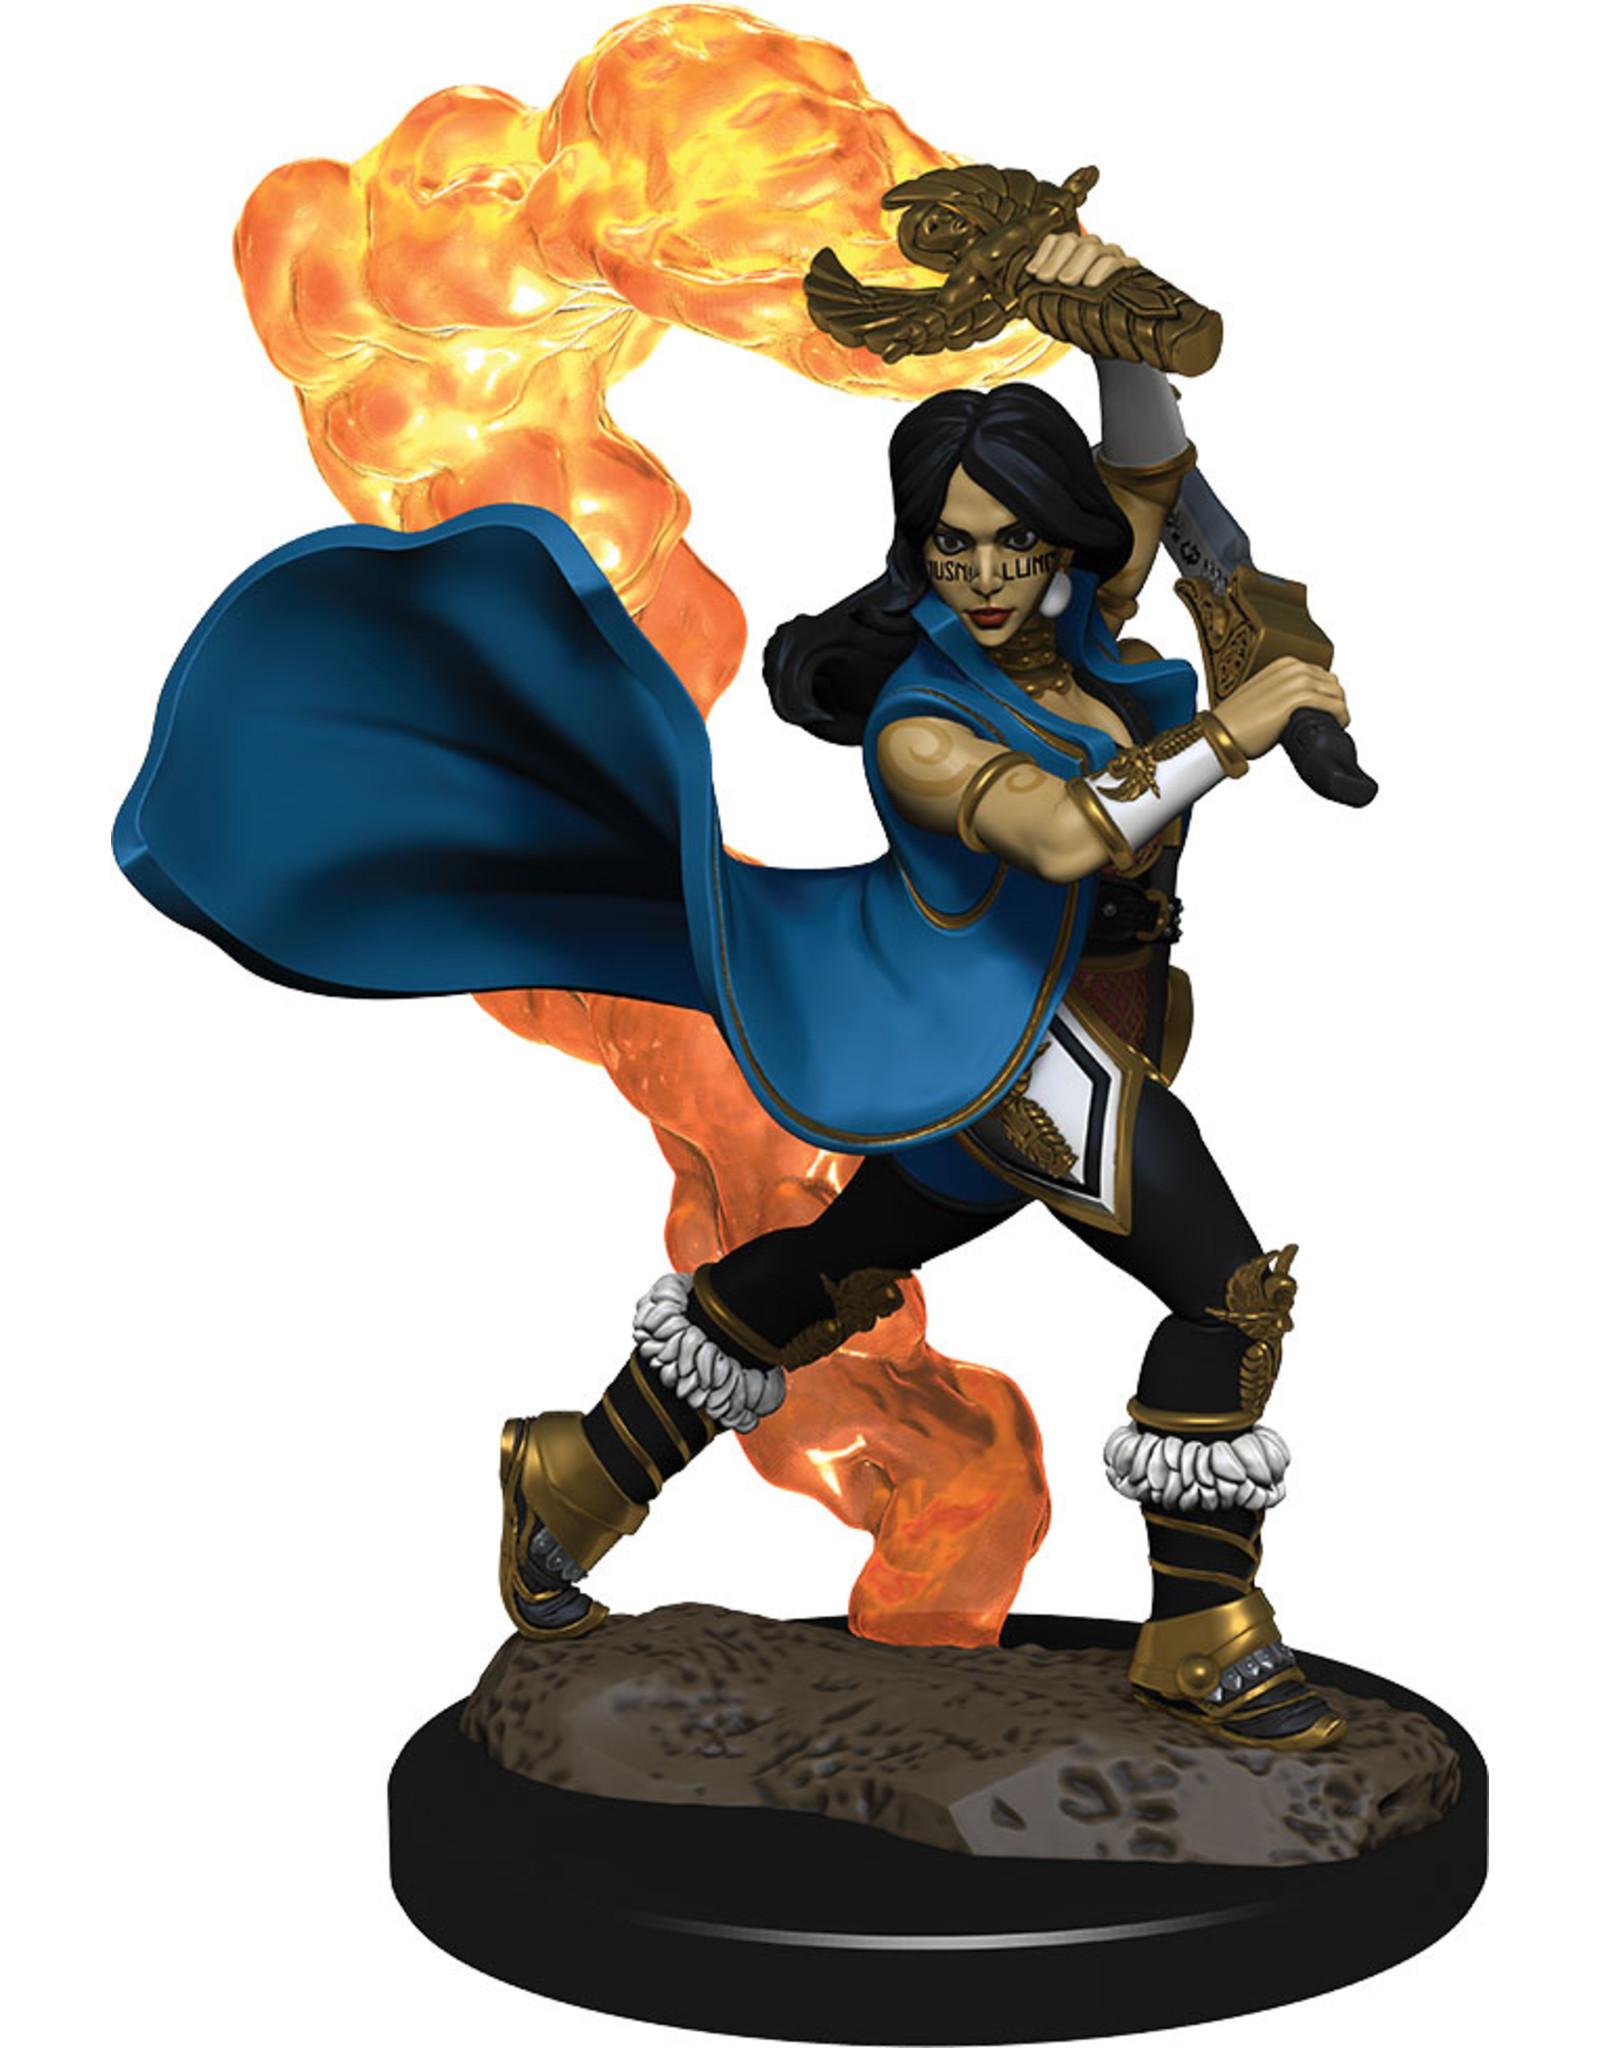 Wiz Kids PF Battles: Premium Painted Figure - W2 Human Cleric Female